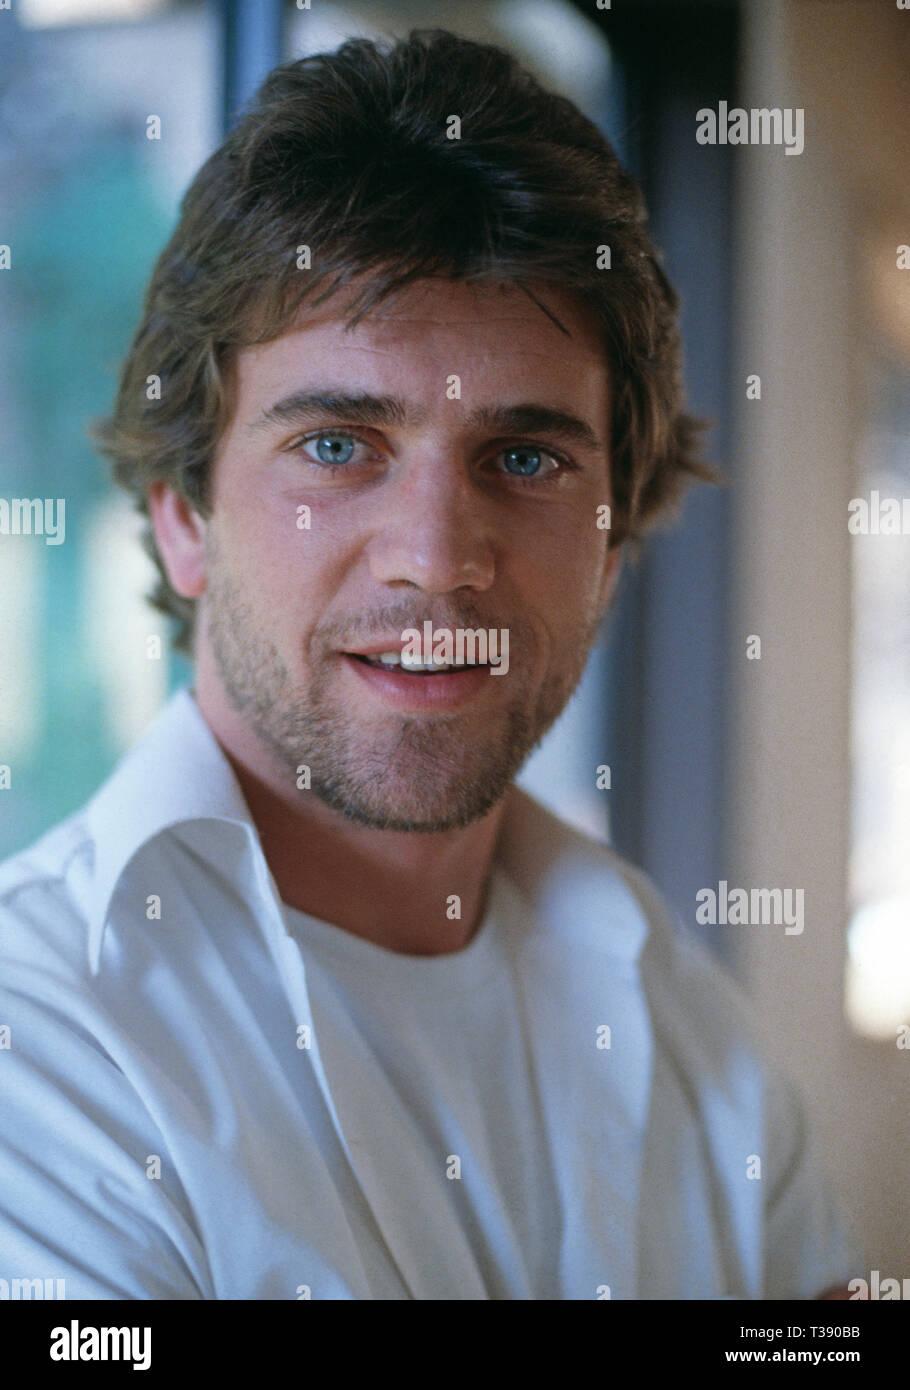 Berühmtheit. American - geborener Schauspieler. Mel Gibson. Australien 1979. Stockbild